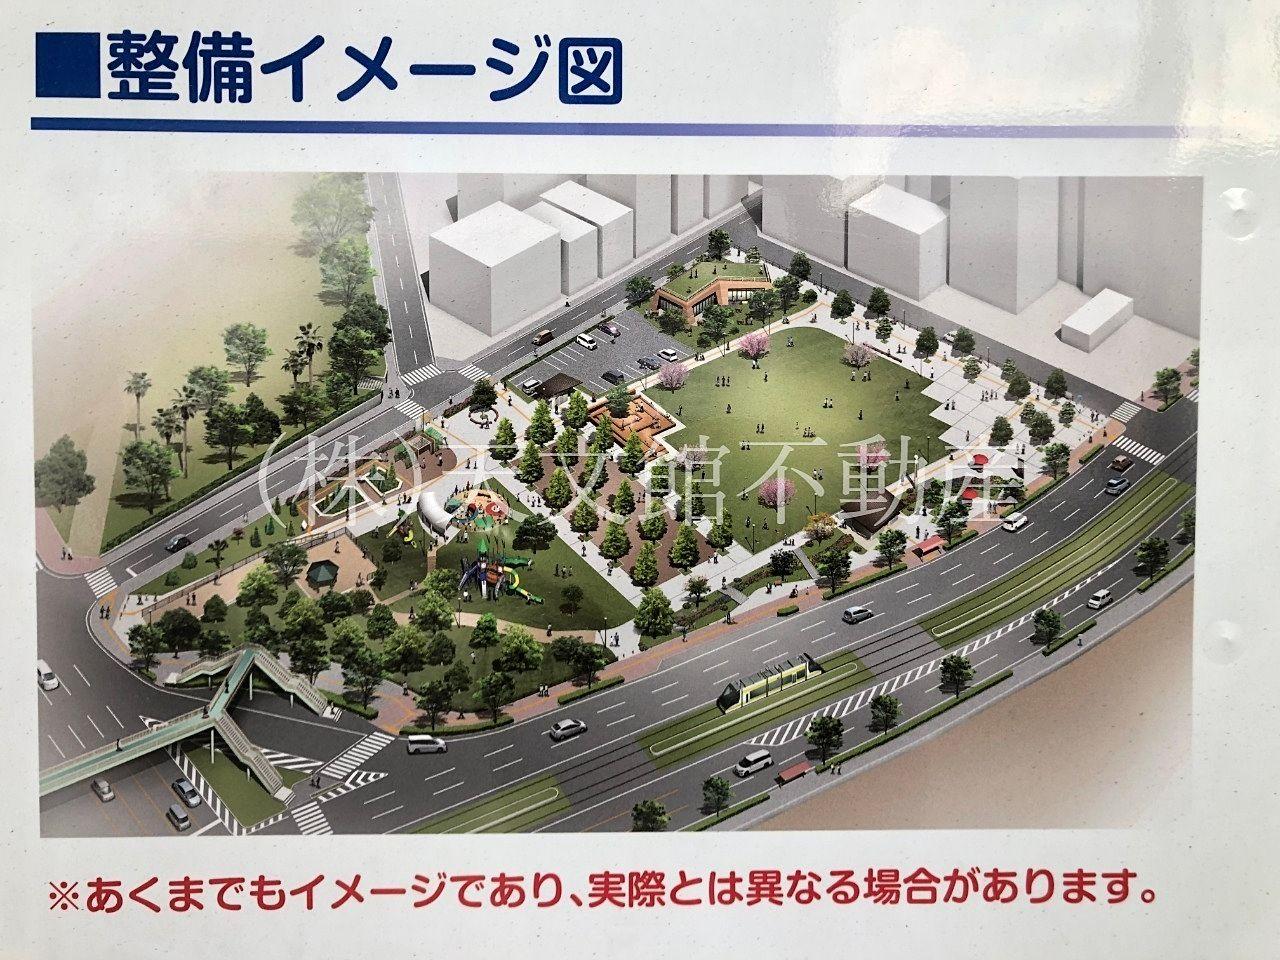 鹿児島市加治屋町 旧市立病院跡地の公園イメージ図